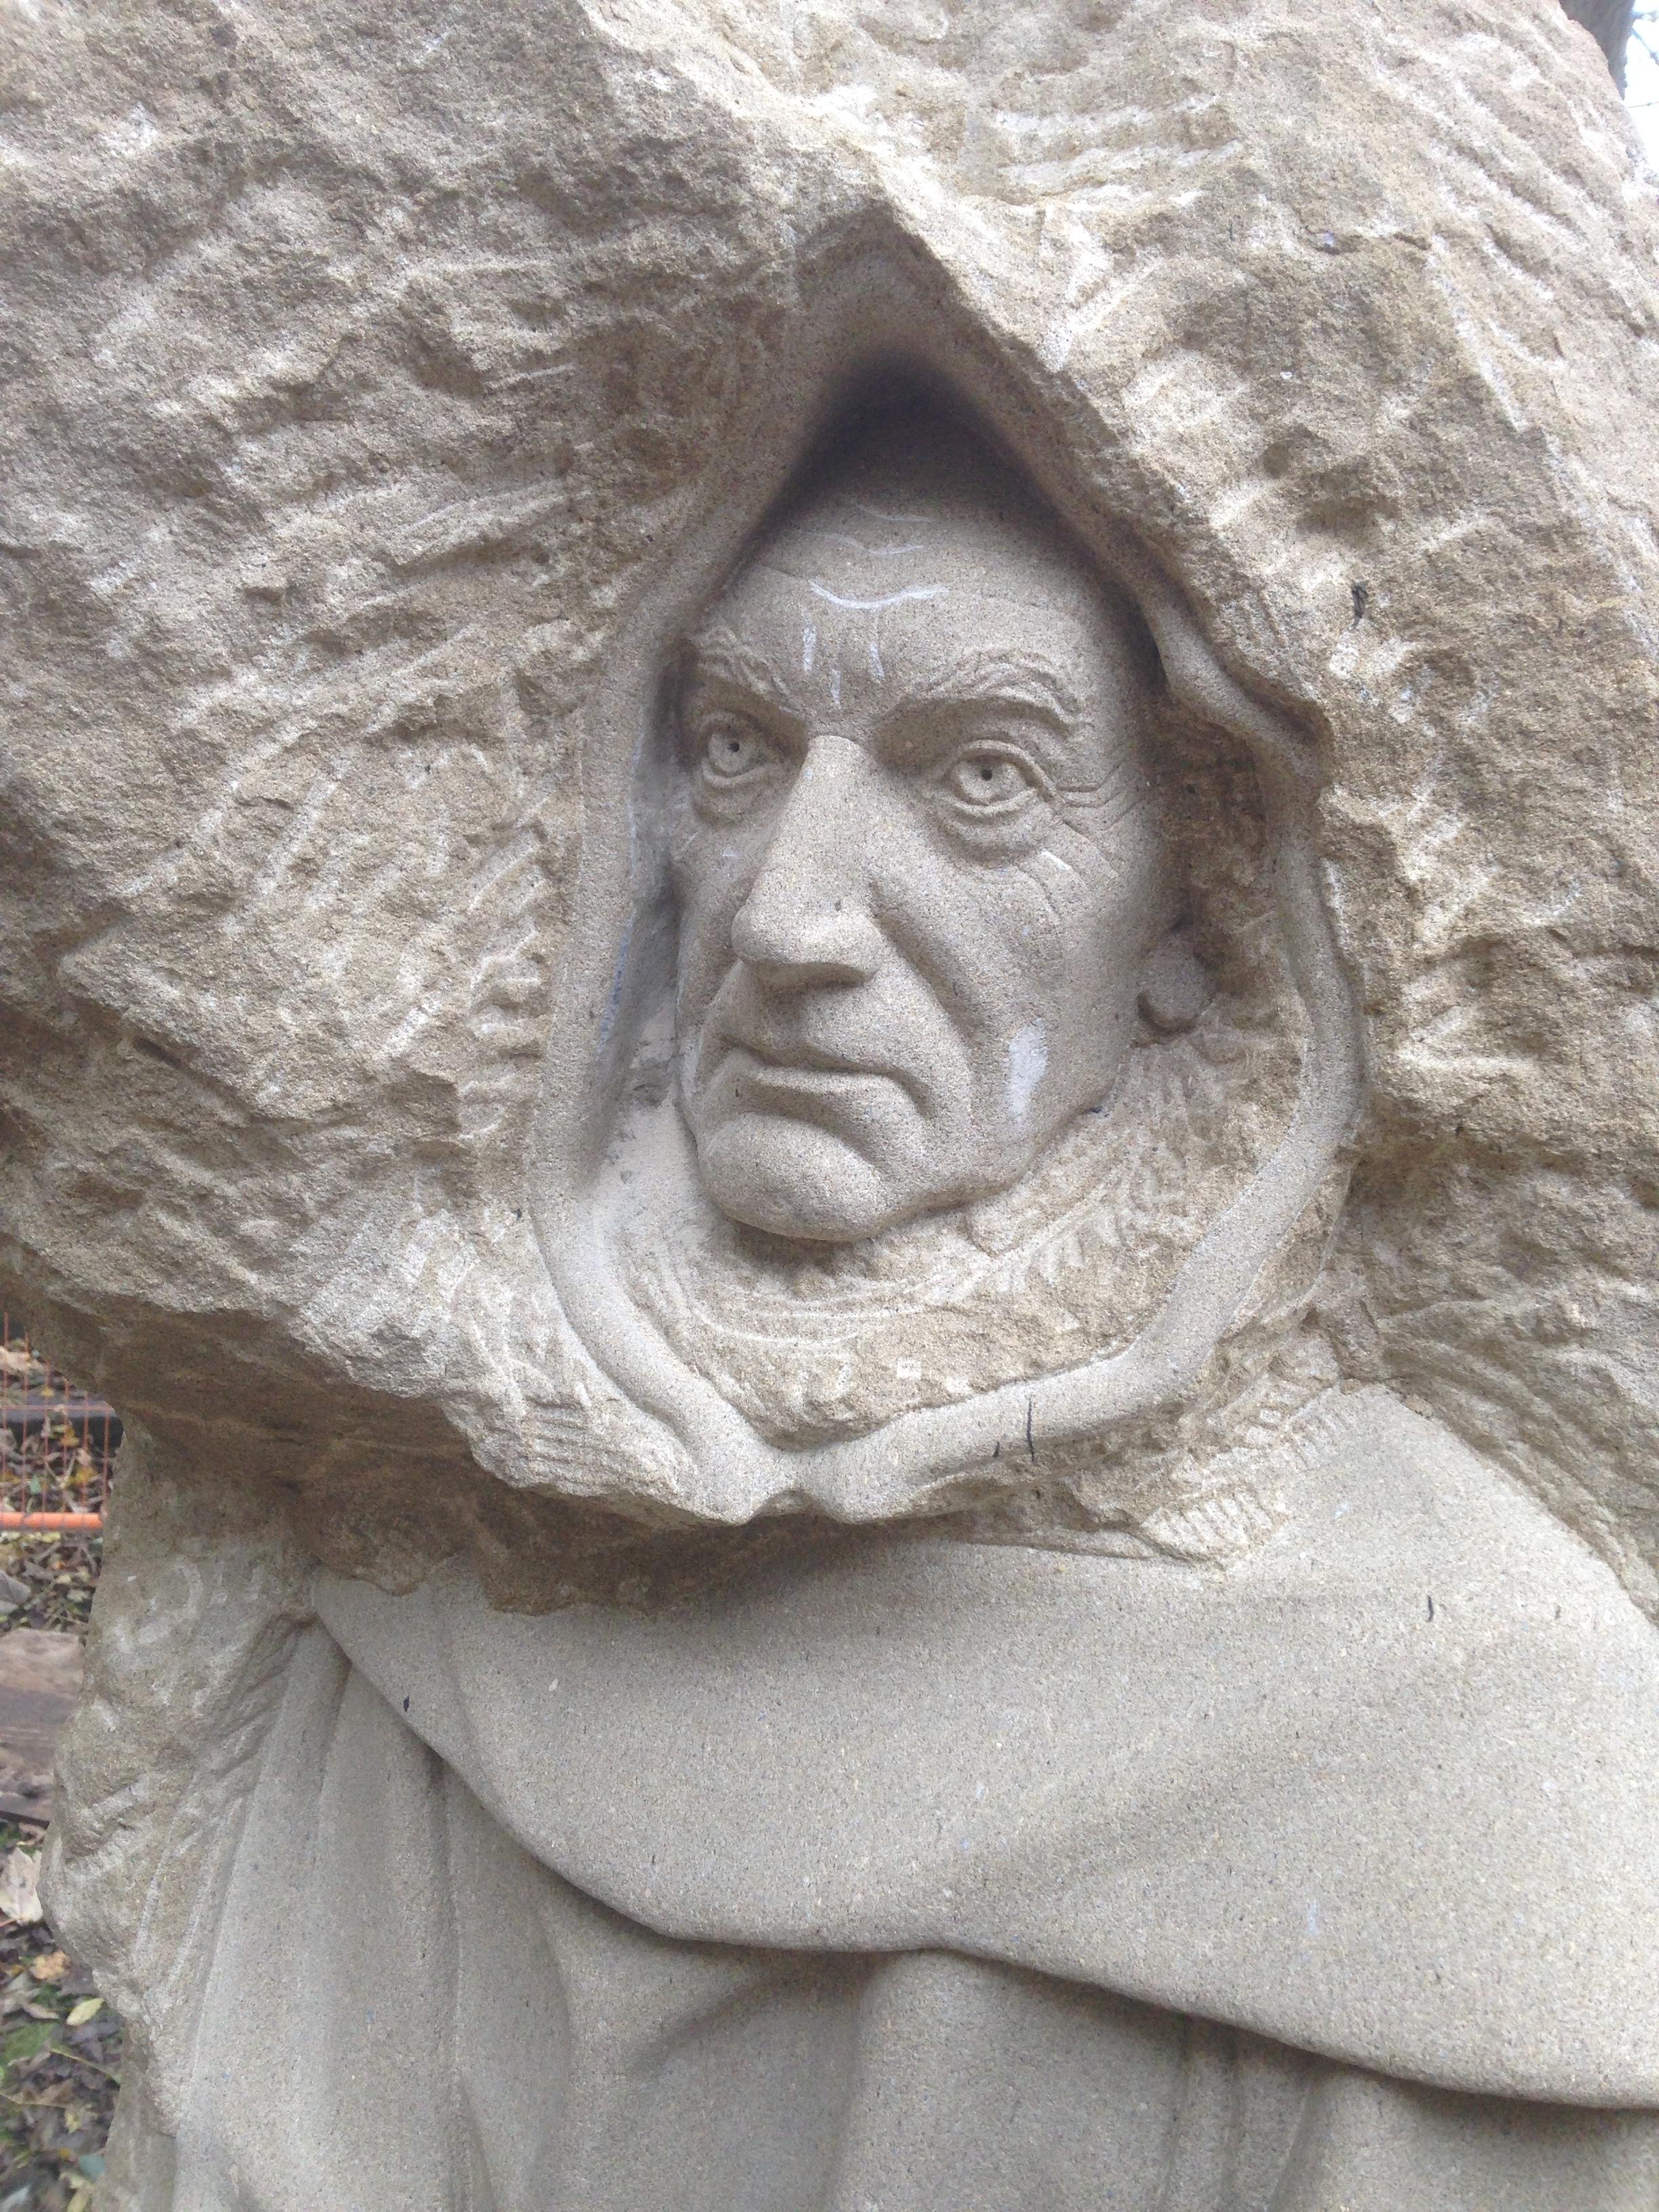 Monk in York stone